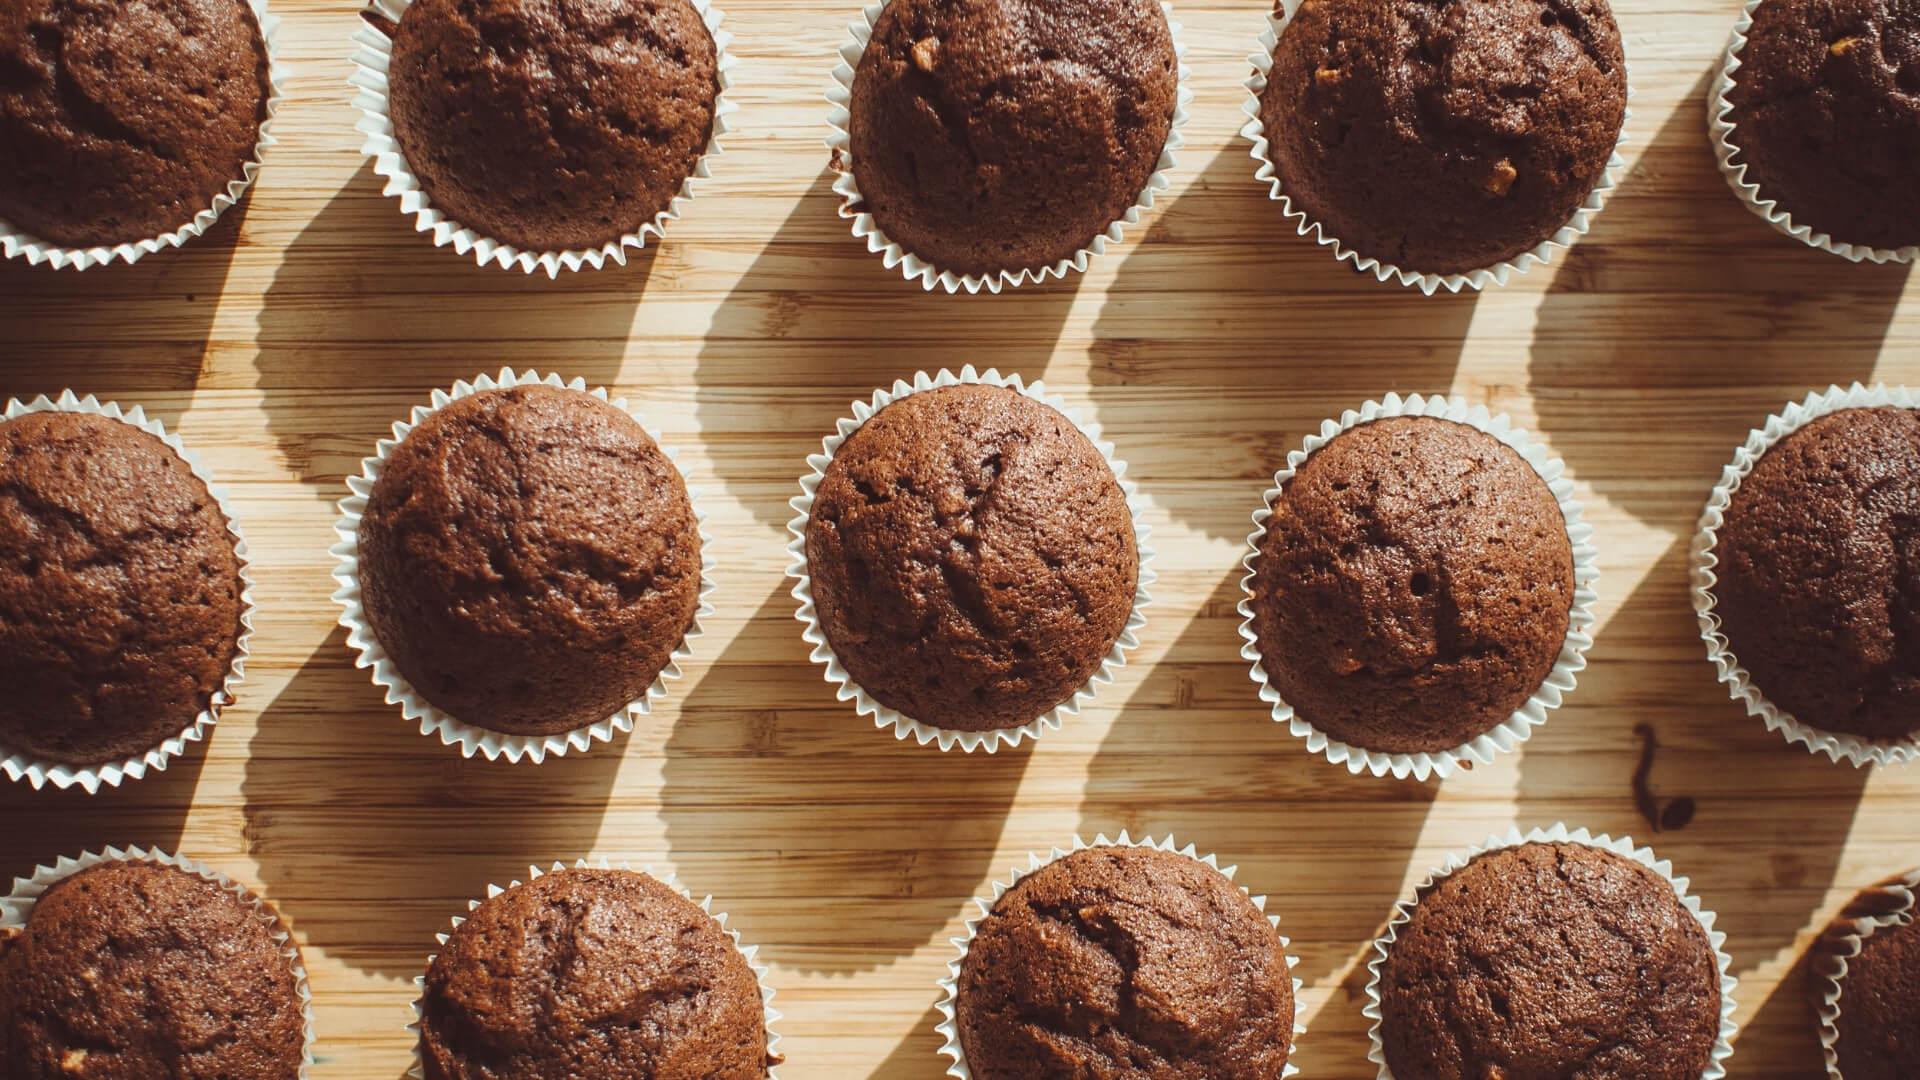 Grain-Free Apple Cinnamon Muffins